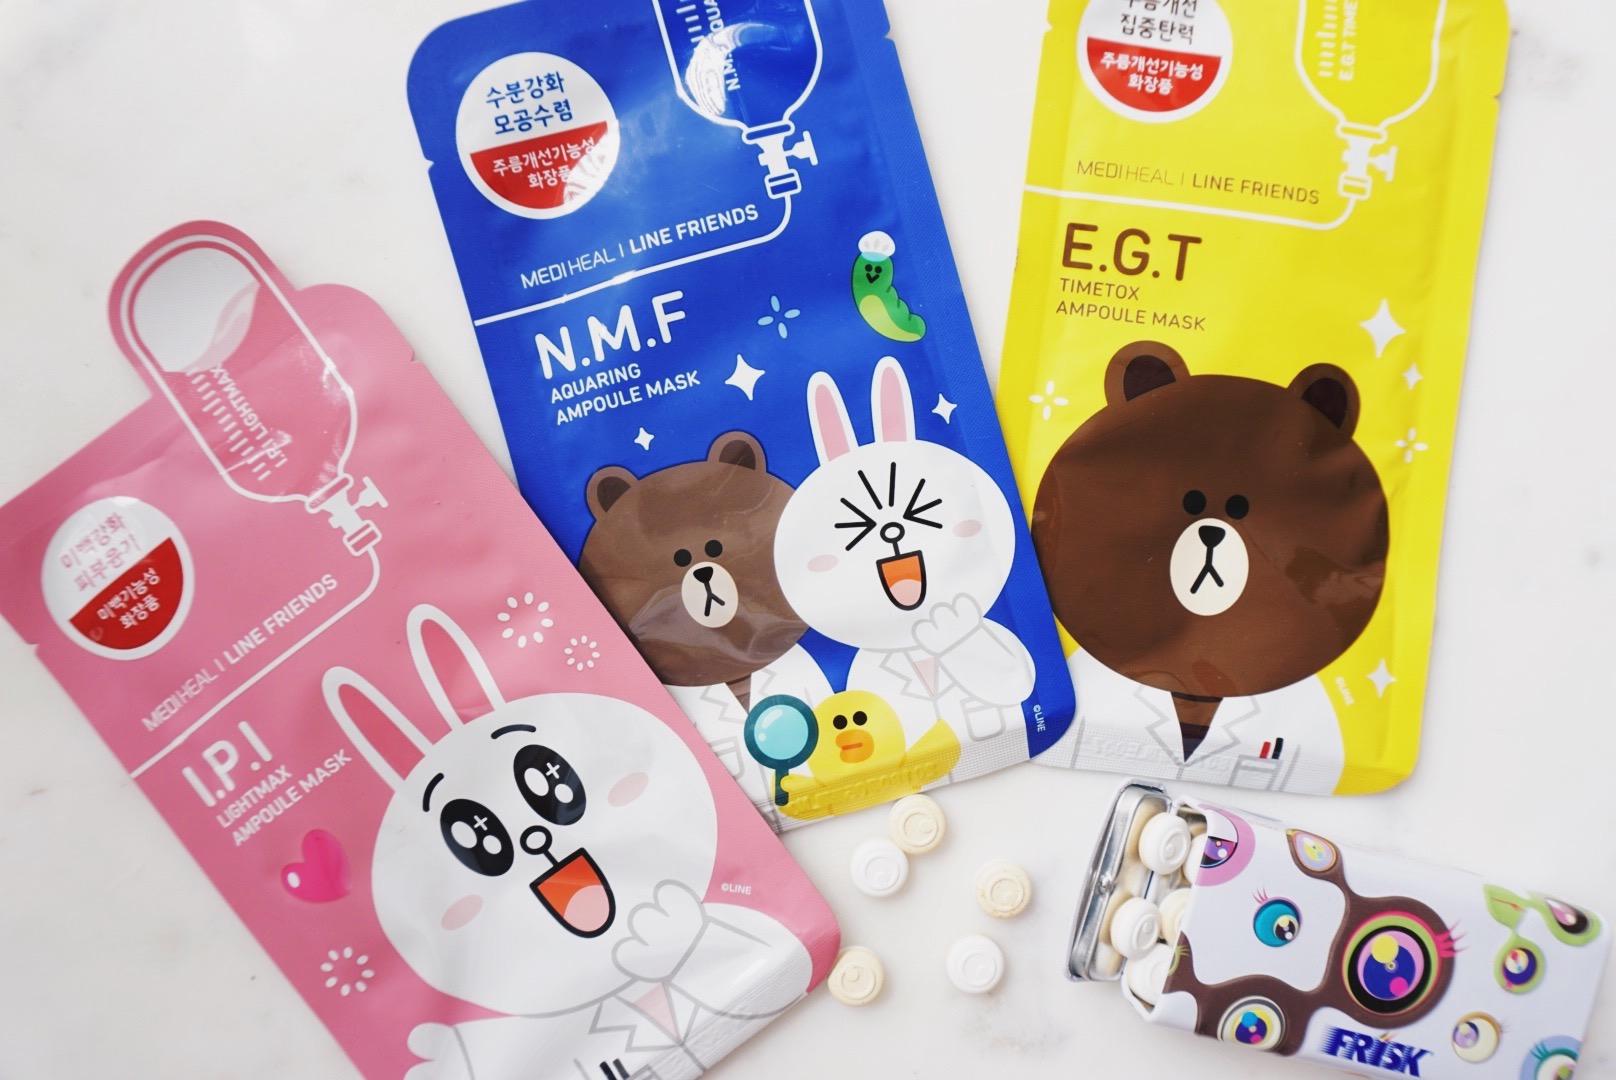 Korean Beauty Haul Ellekae Mediheal Line Friends Ampoule Mask Memebox